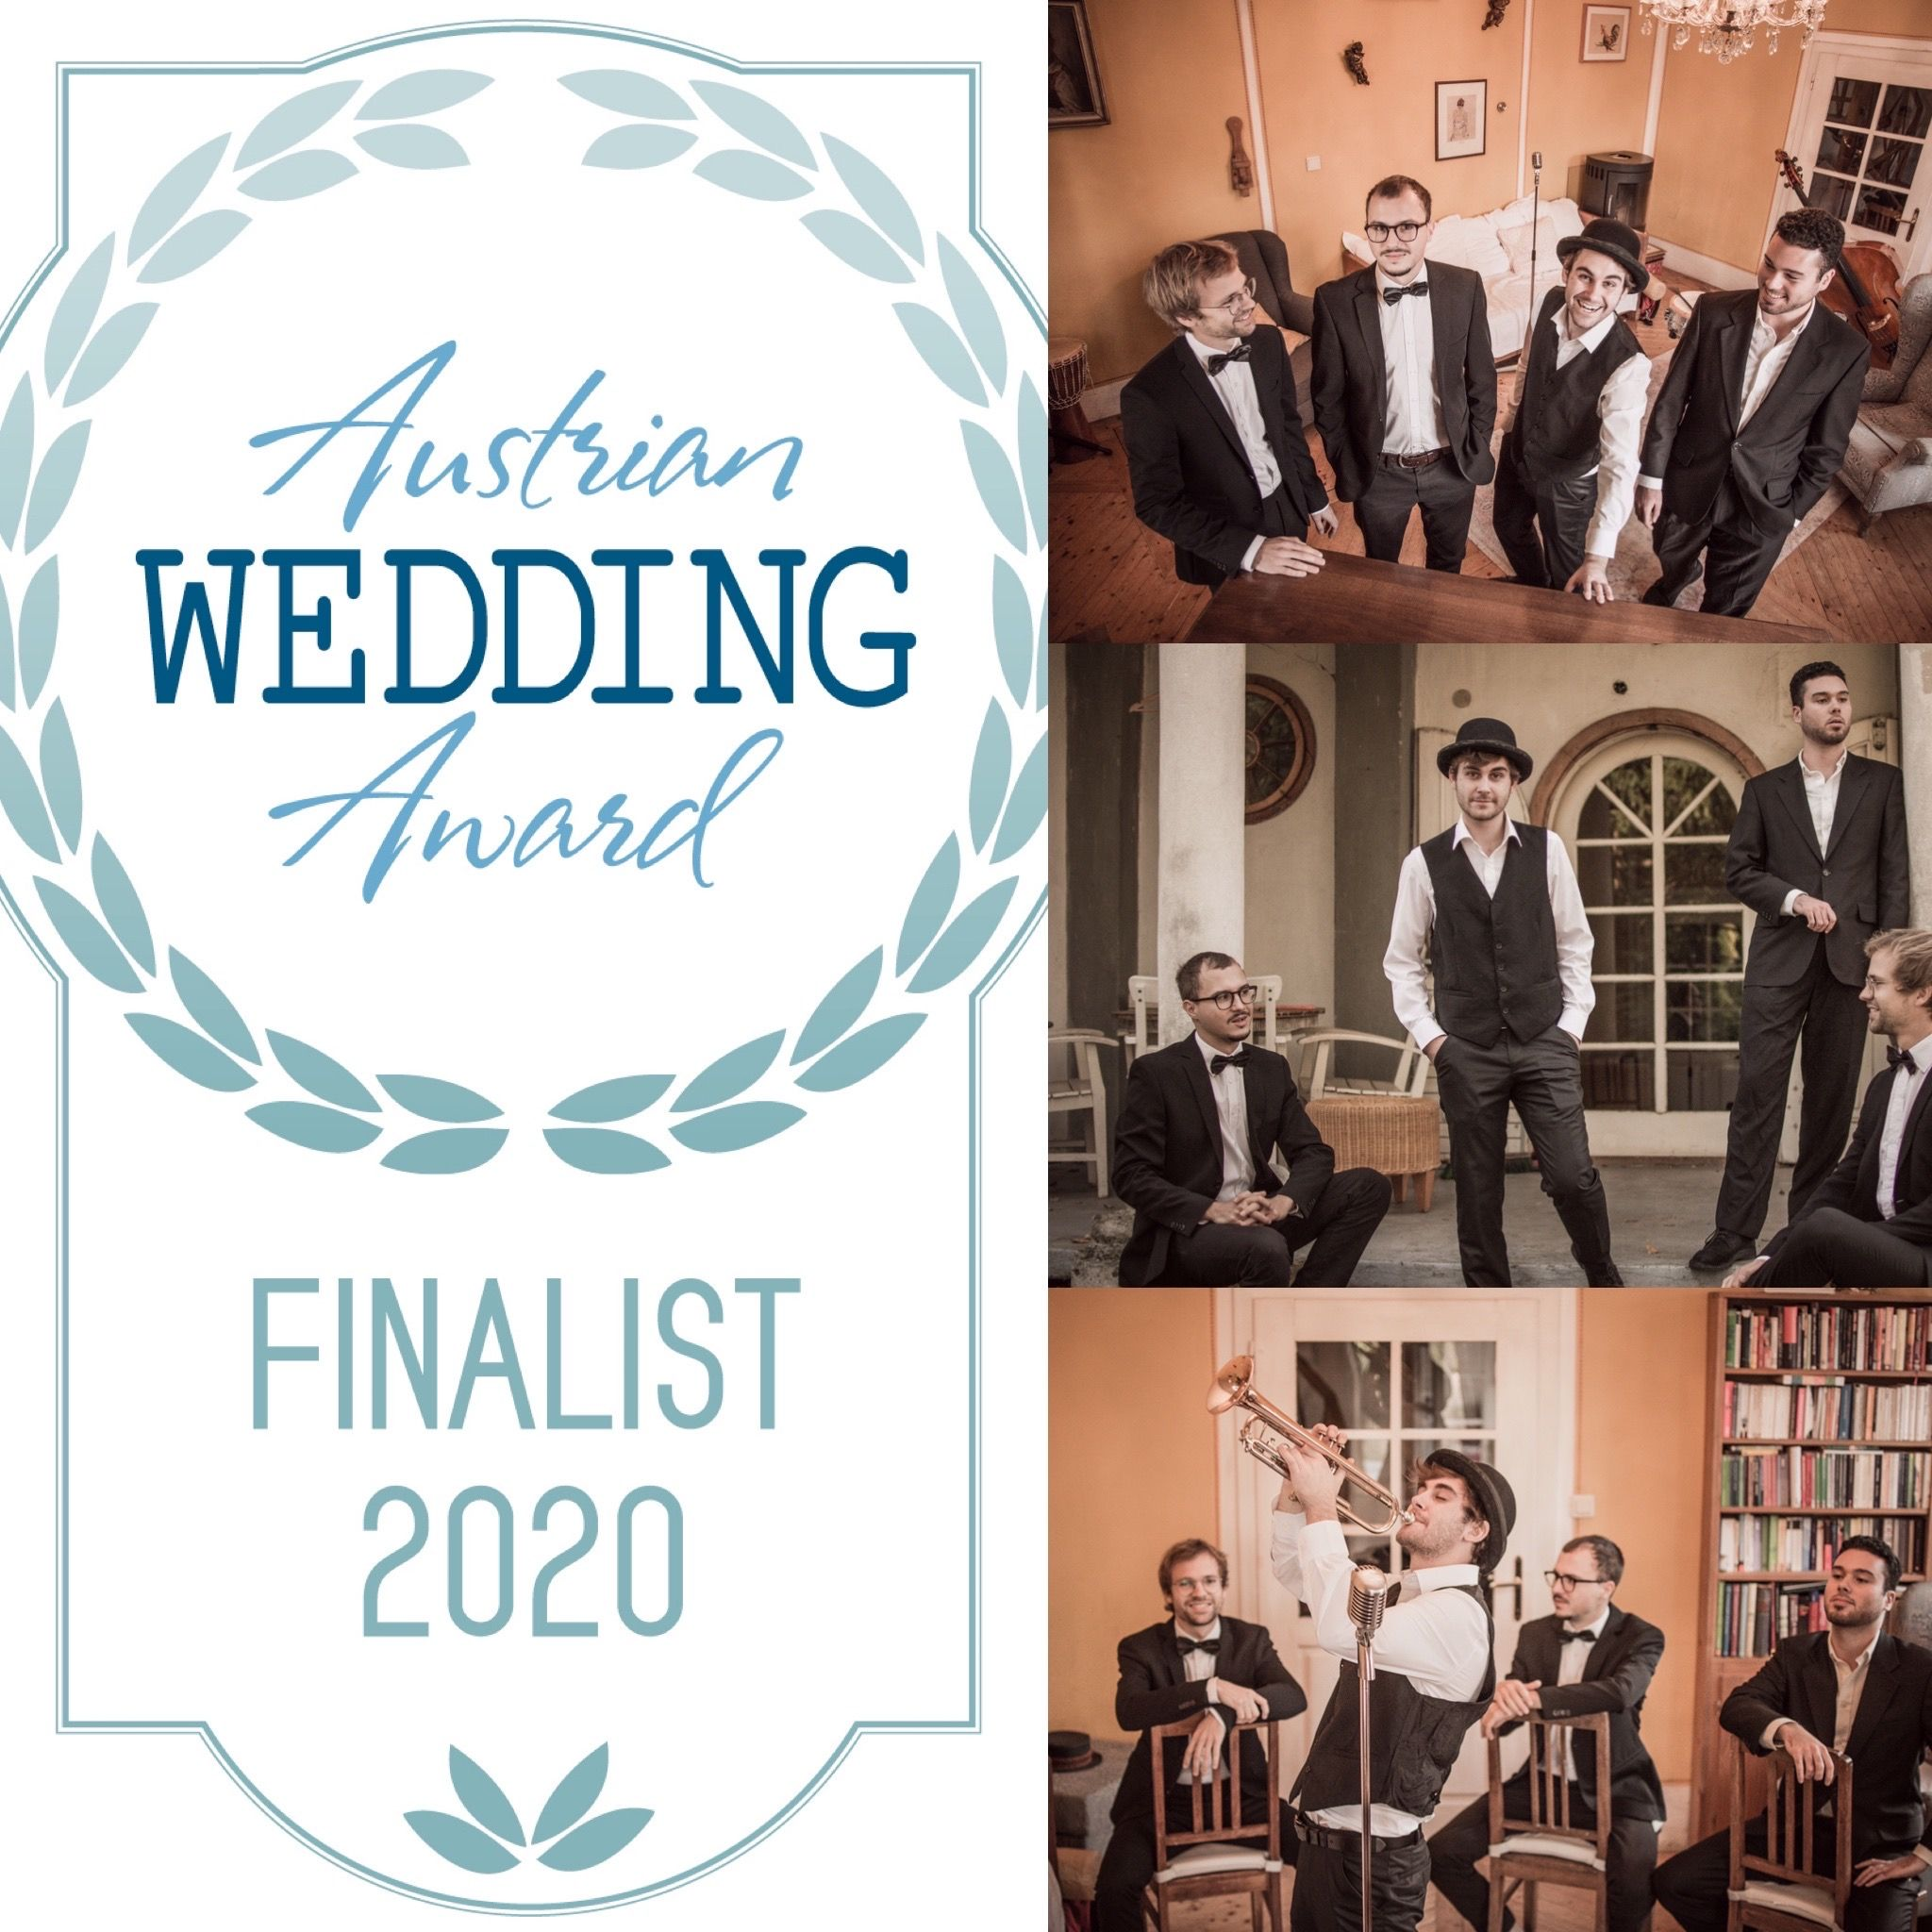 Austrian Wedding Award Finalist All Jazz Ambassadors Hochzeit Jazz Live Band